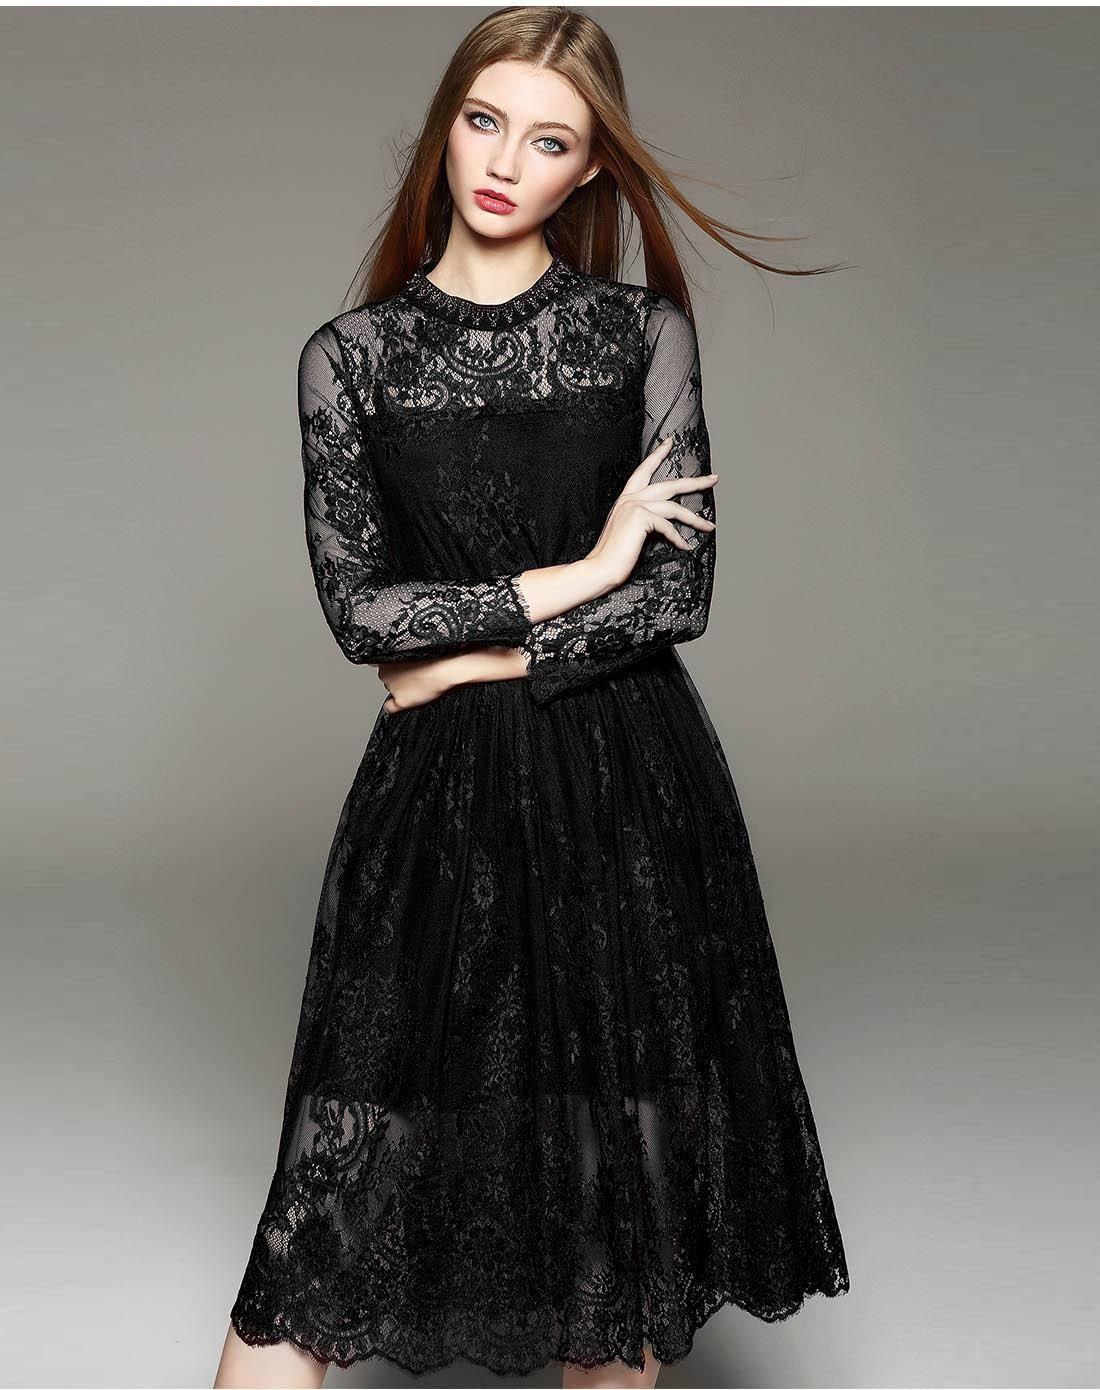 Long sleeve black wedding dresses  Black Hollow Lace Long Sleeve Midi Dress Black FLENKIY  VIPme